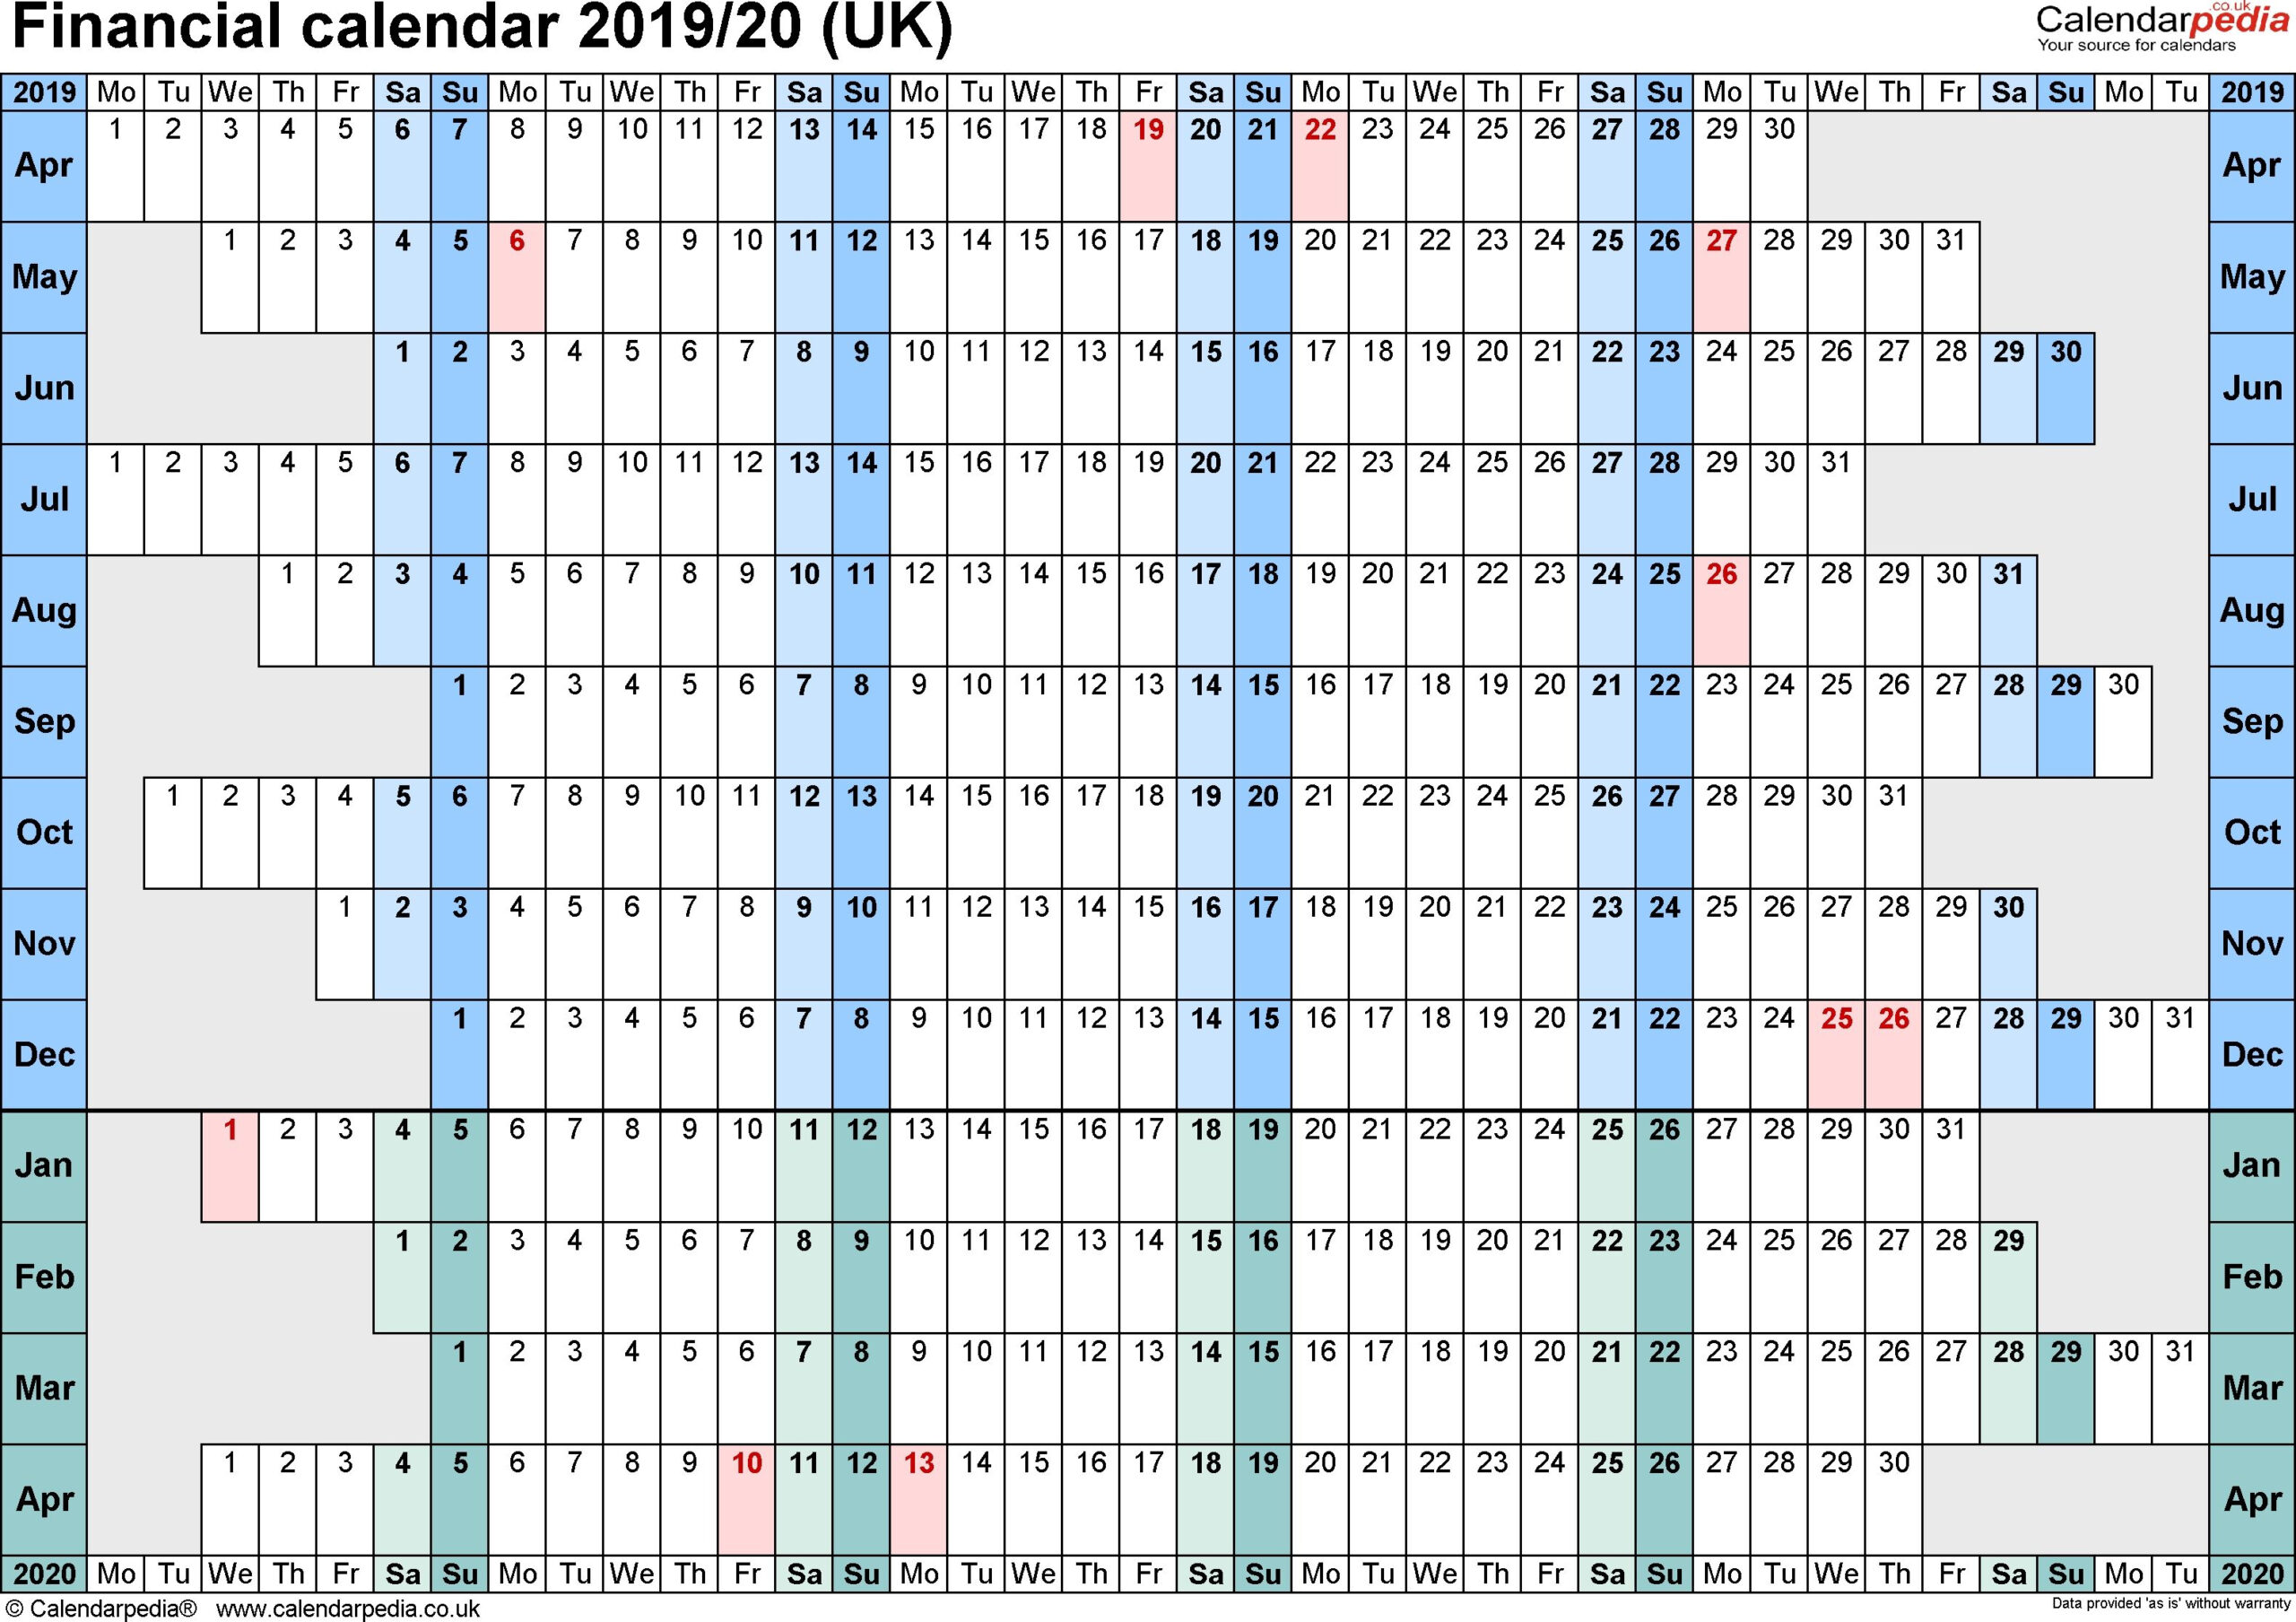 Financial Week Calendar Uk In 2020 | Calendar Uk Calendar